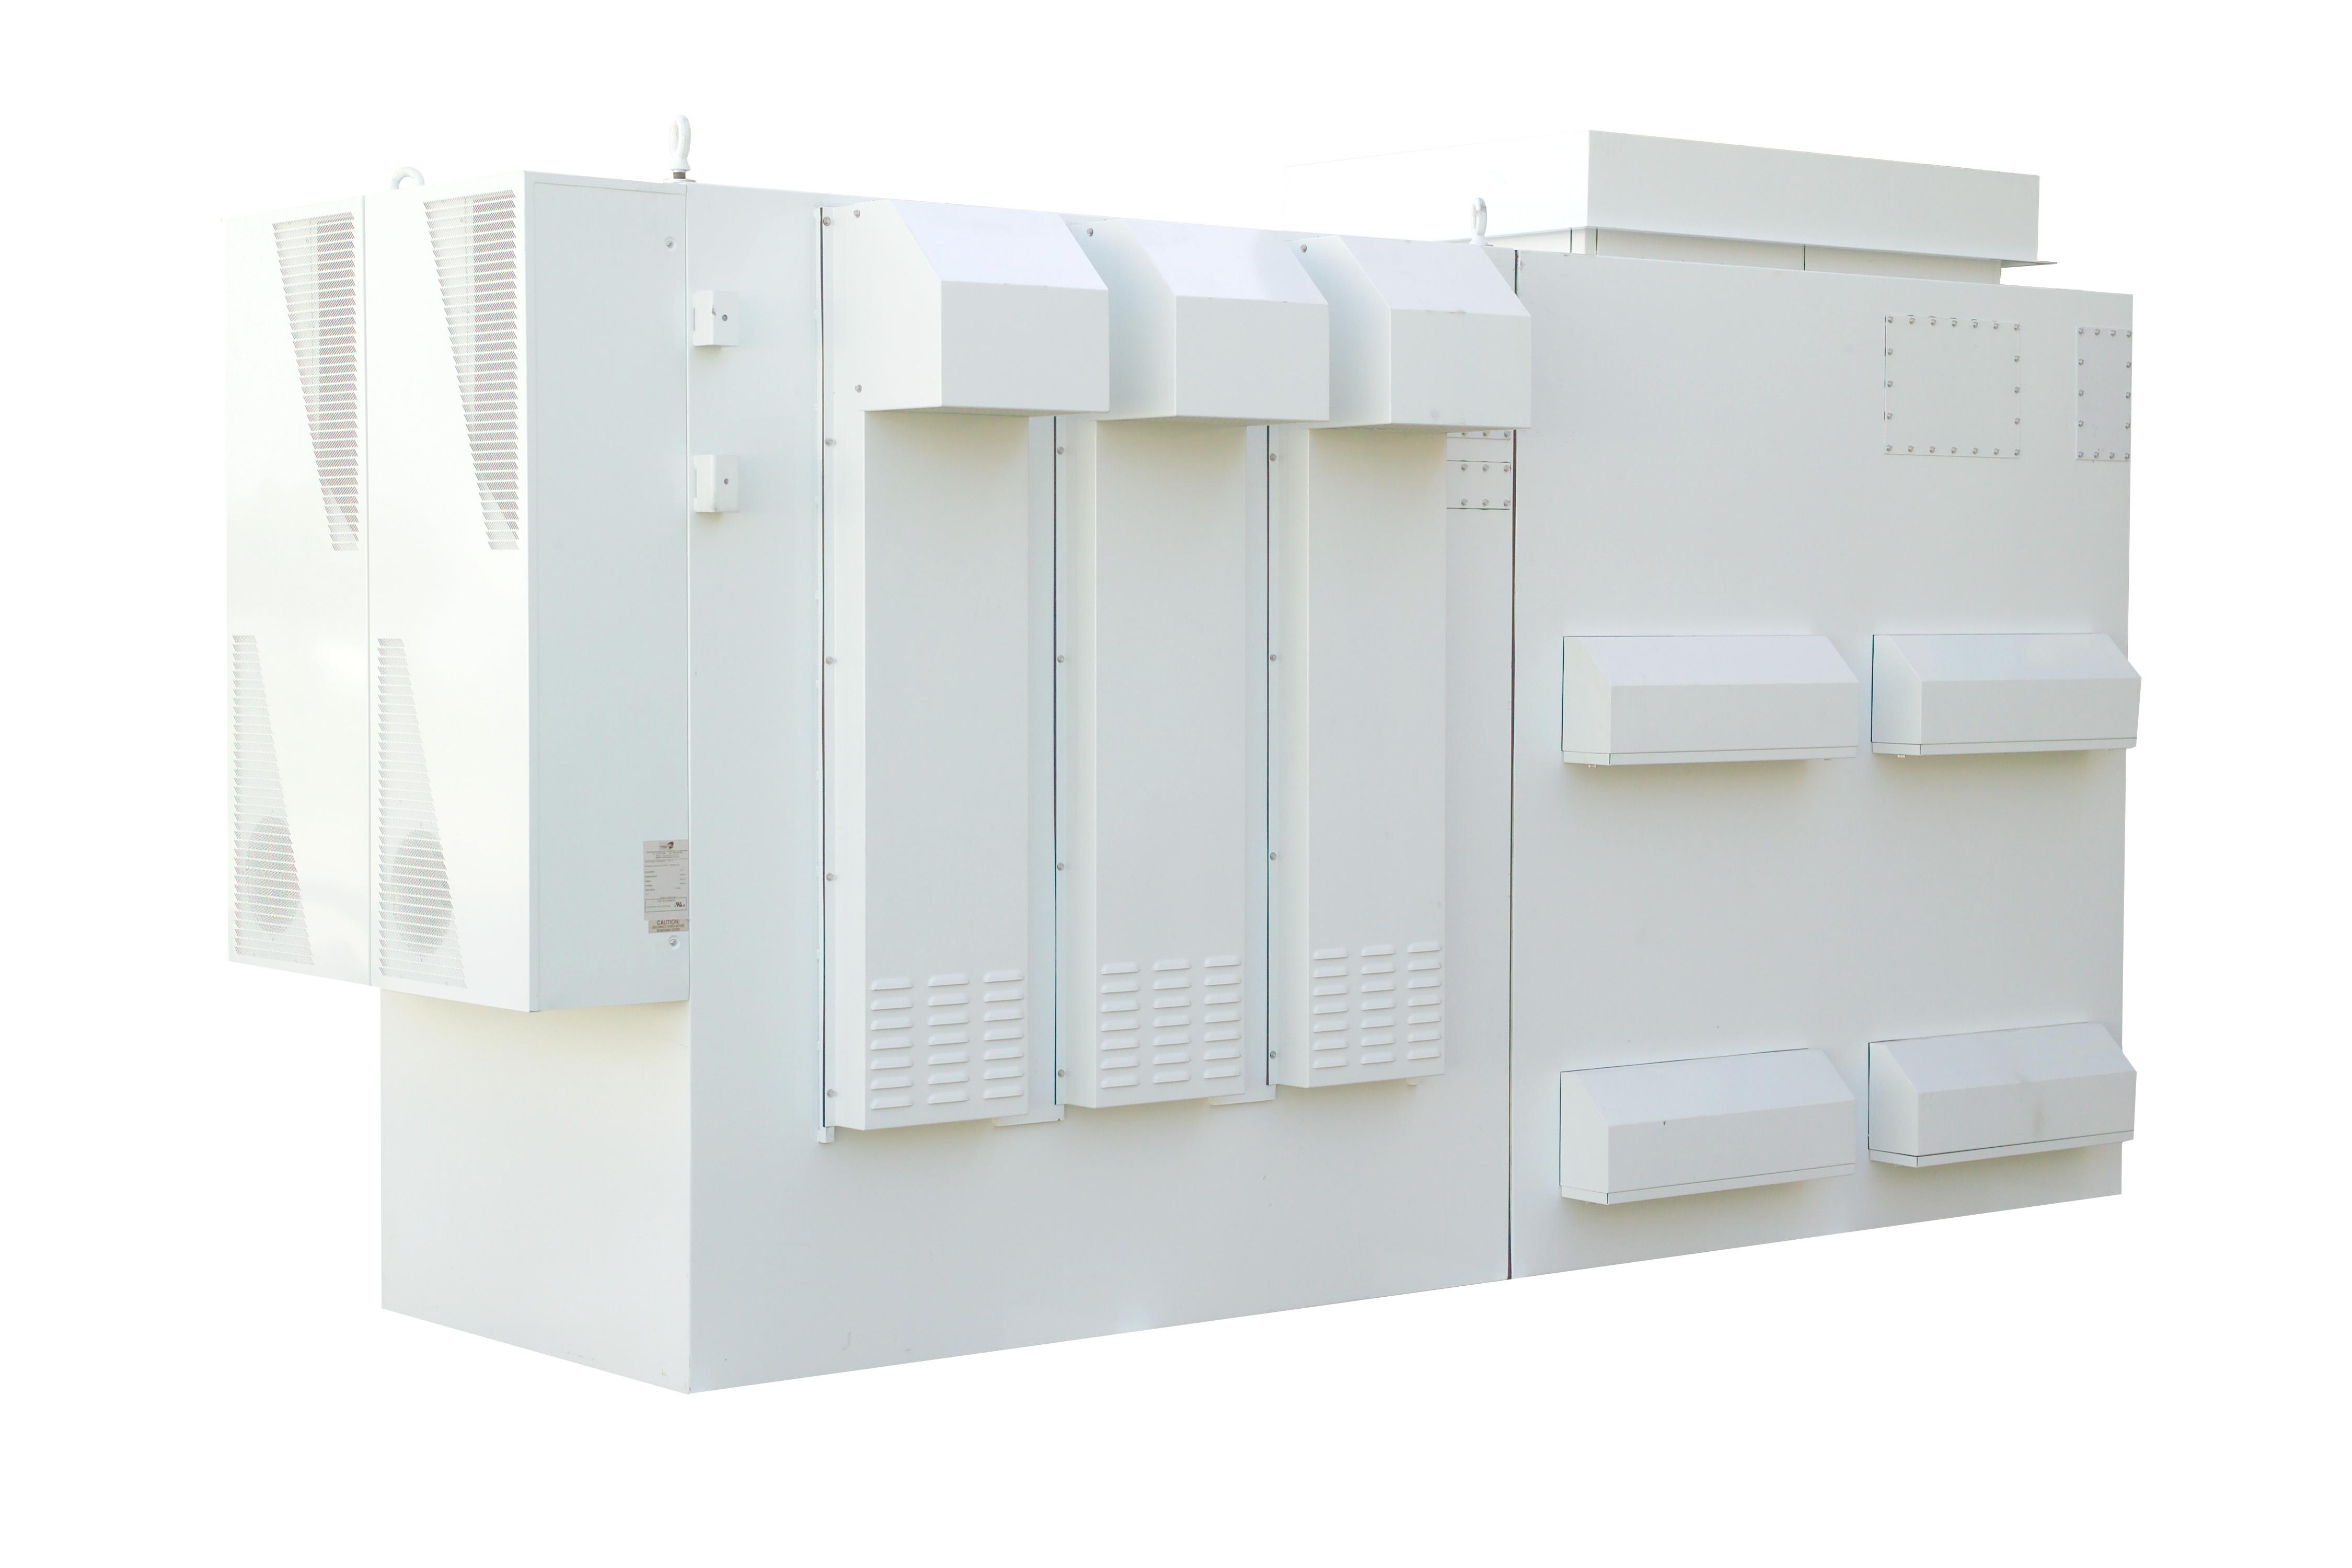 mtx outdoor motors drives toshiba international corporation  product image gallery